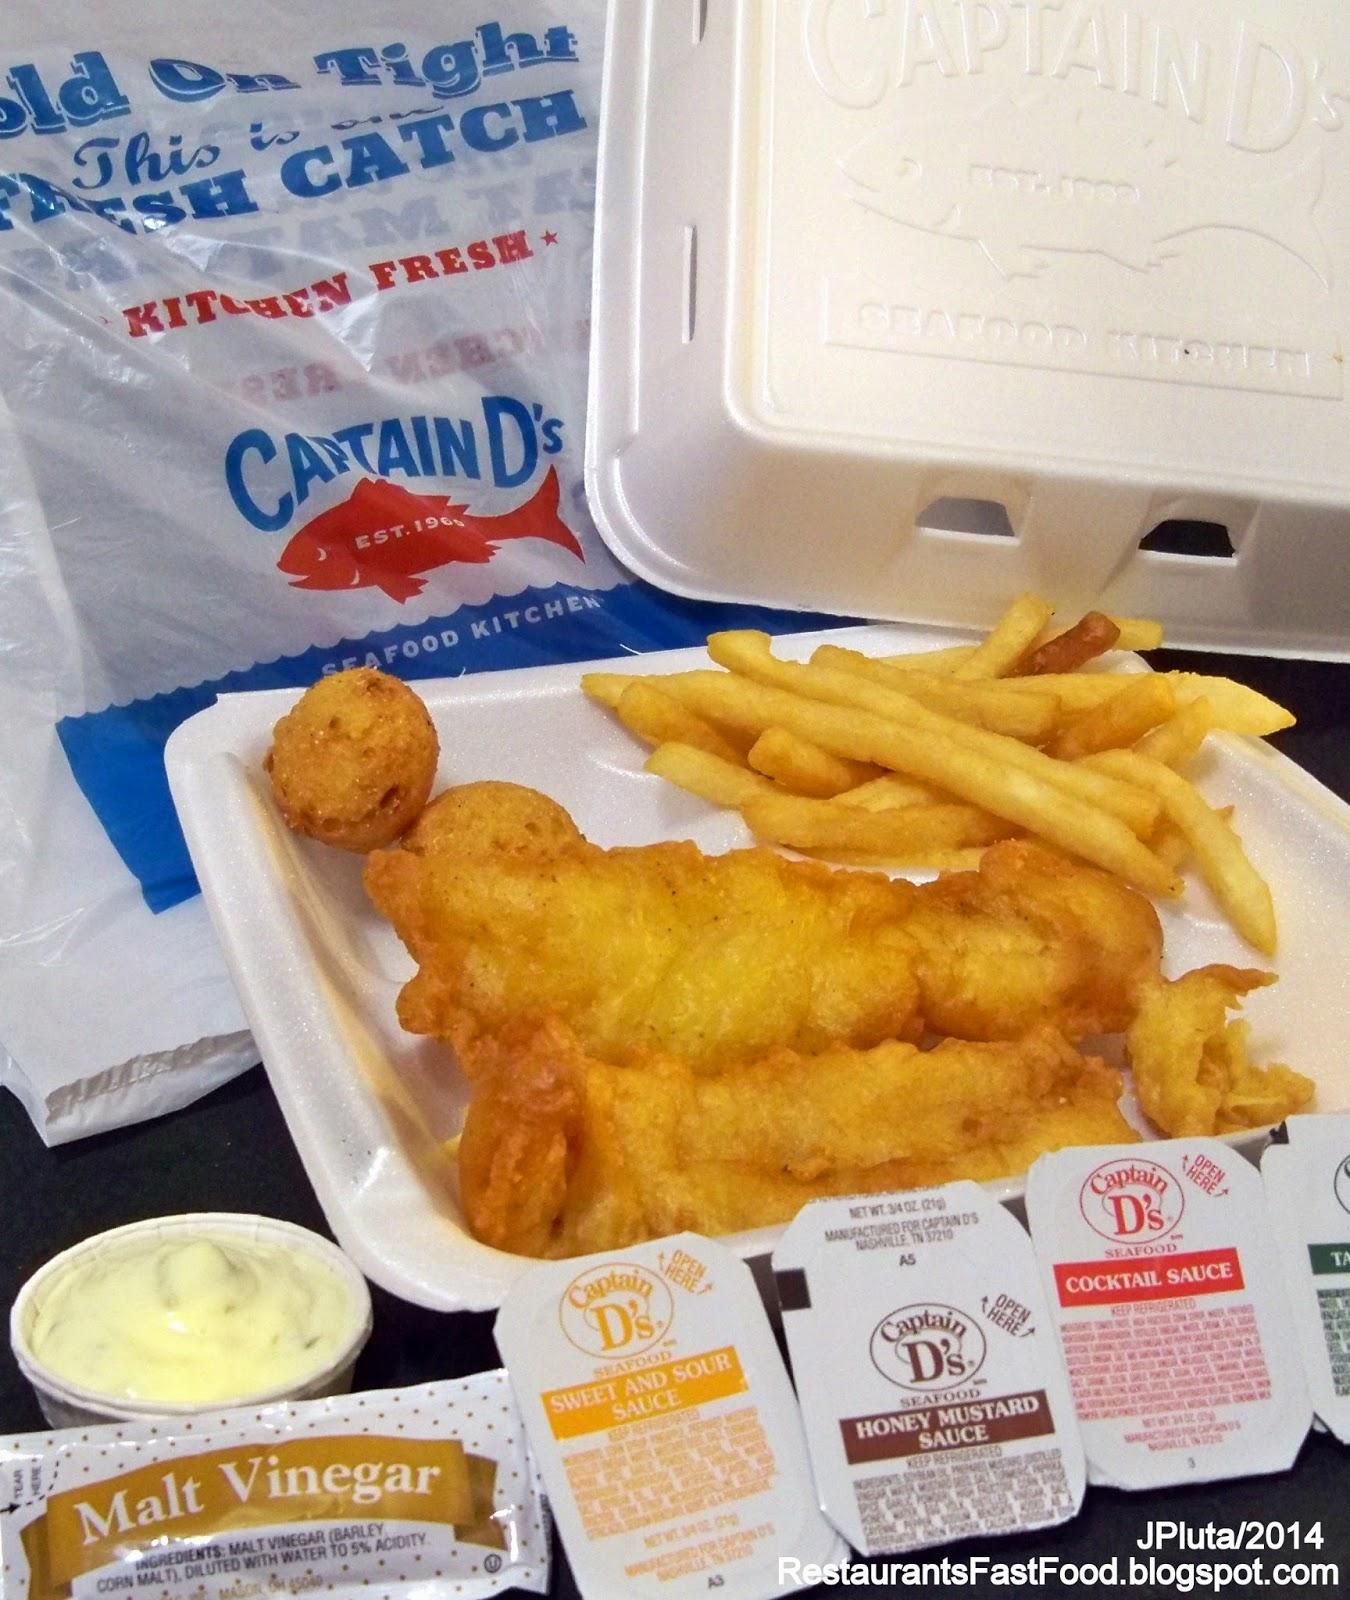 Fast Food Fish Restaurants Near Me | Best Restaurants Near Me - photo#8